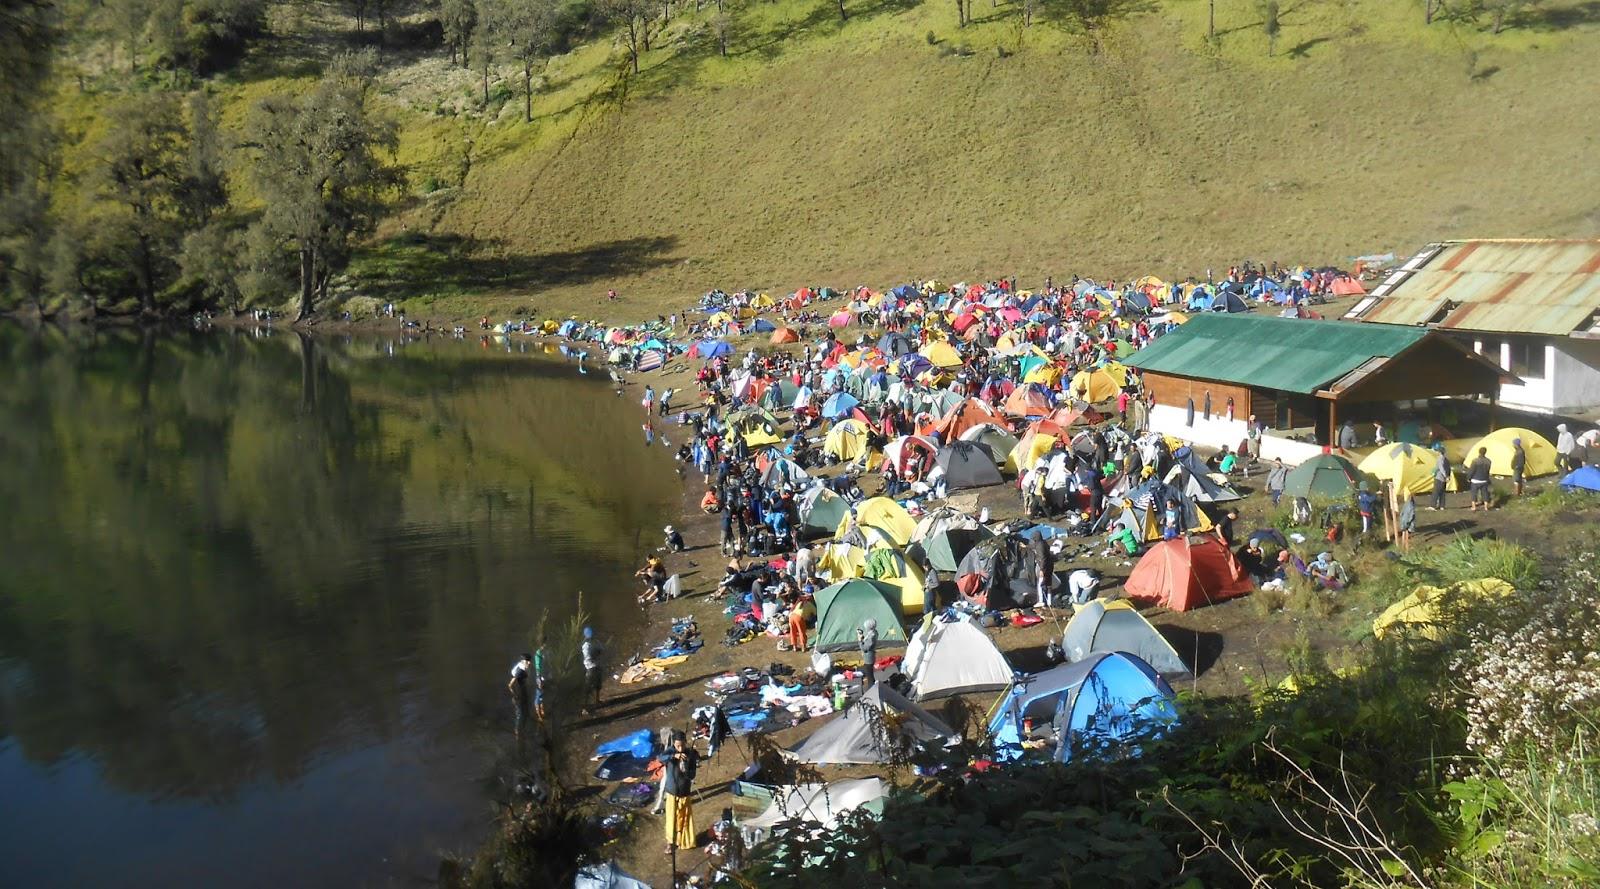 camping ground merusak ekosistem dan lingkungan hidup Pendakian Gunung Massal